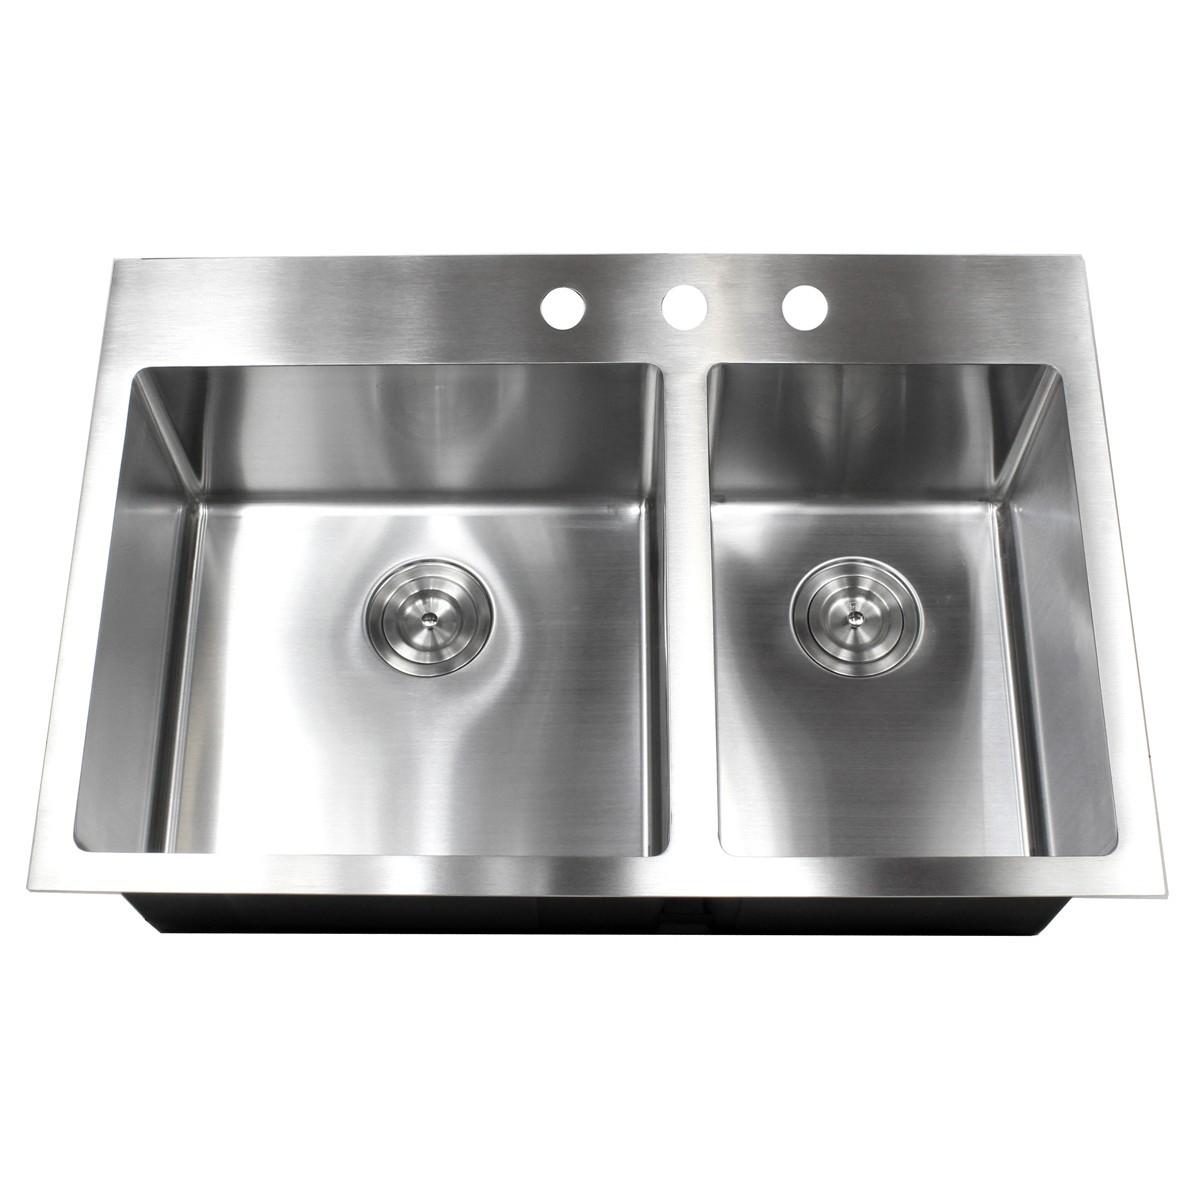 double bowl kitchen sink modern flooring 33 inch top mount drop in stainless steel